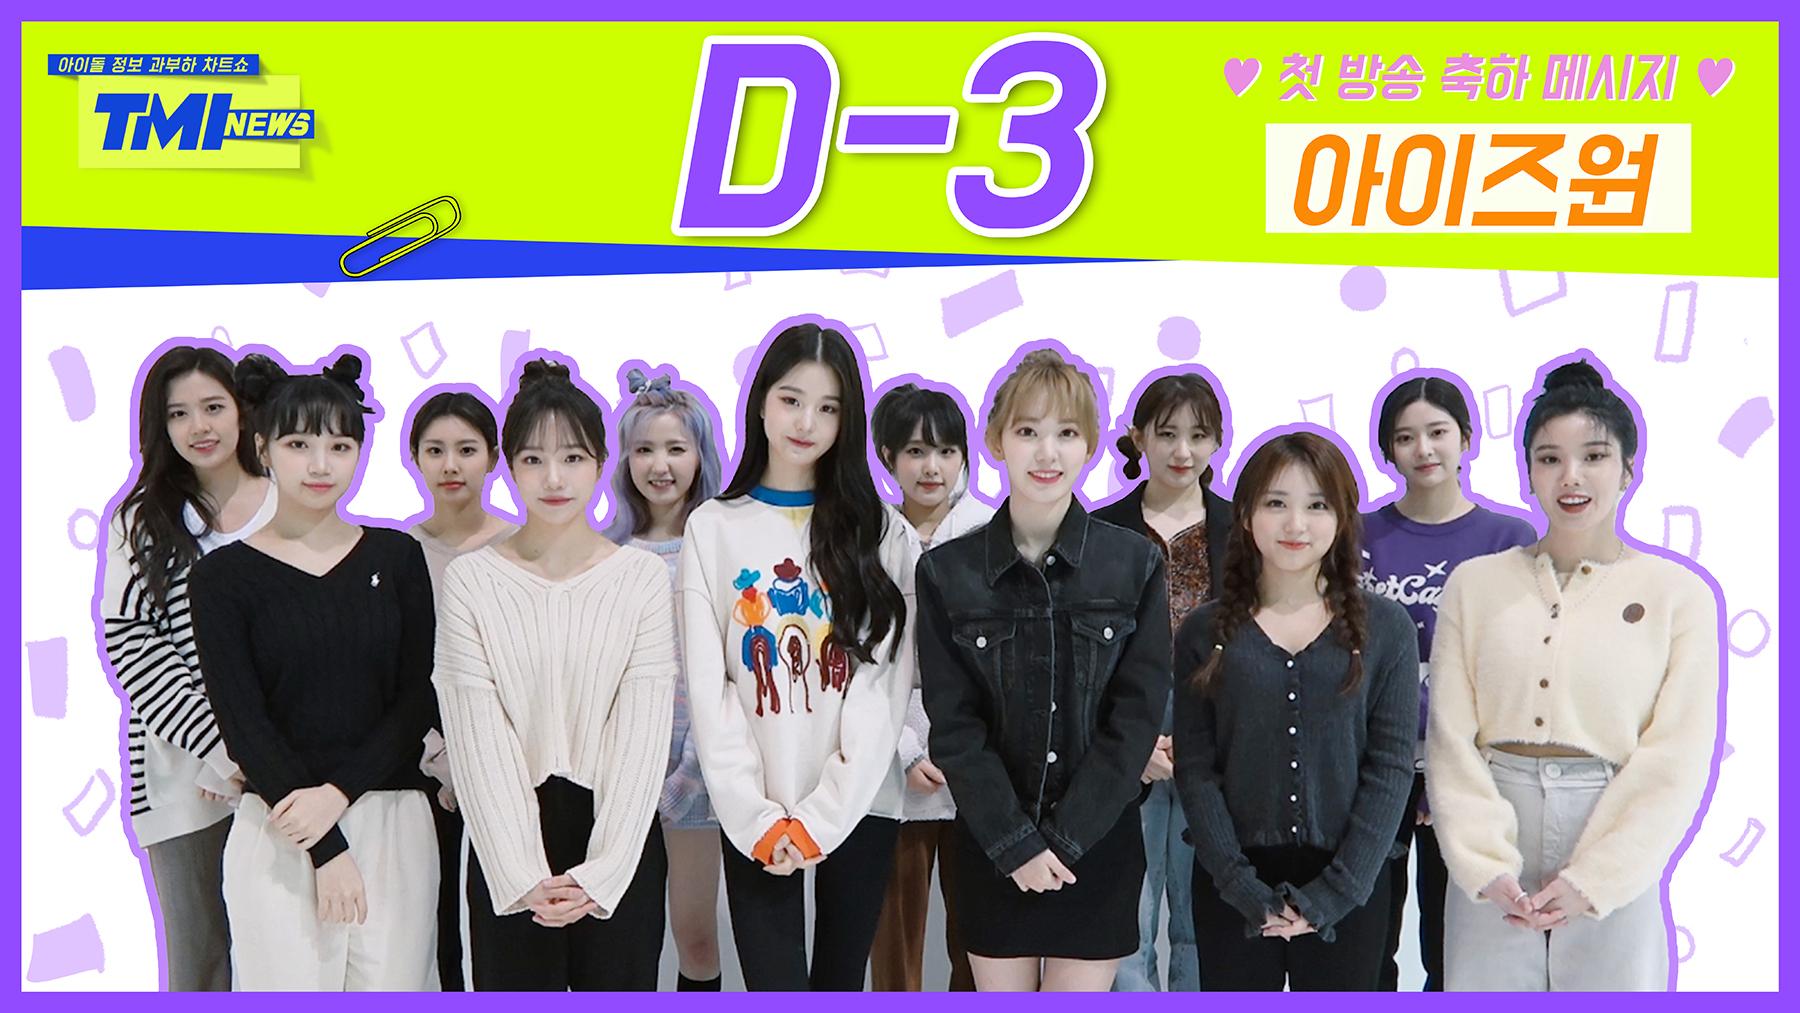 [TMI NEWS] '첫방 D-3' 축하 메시지♥ from.아이즈원